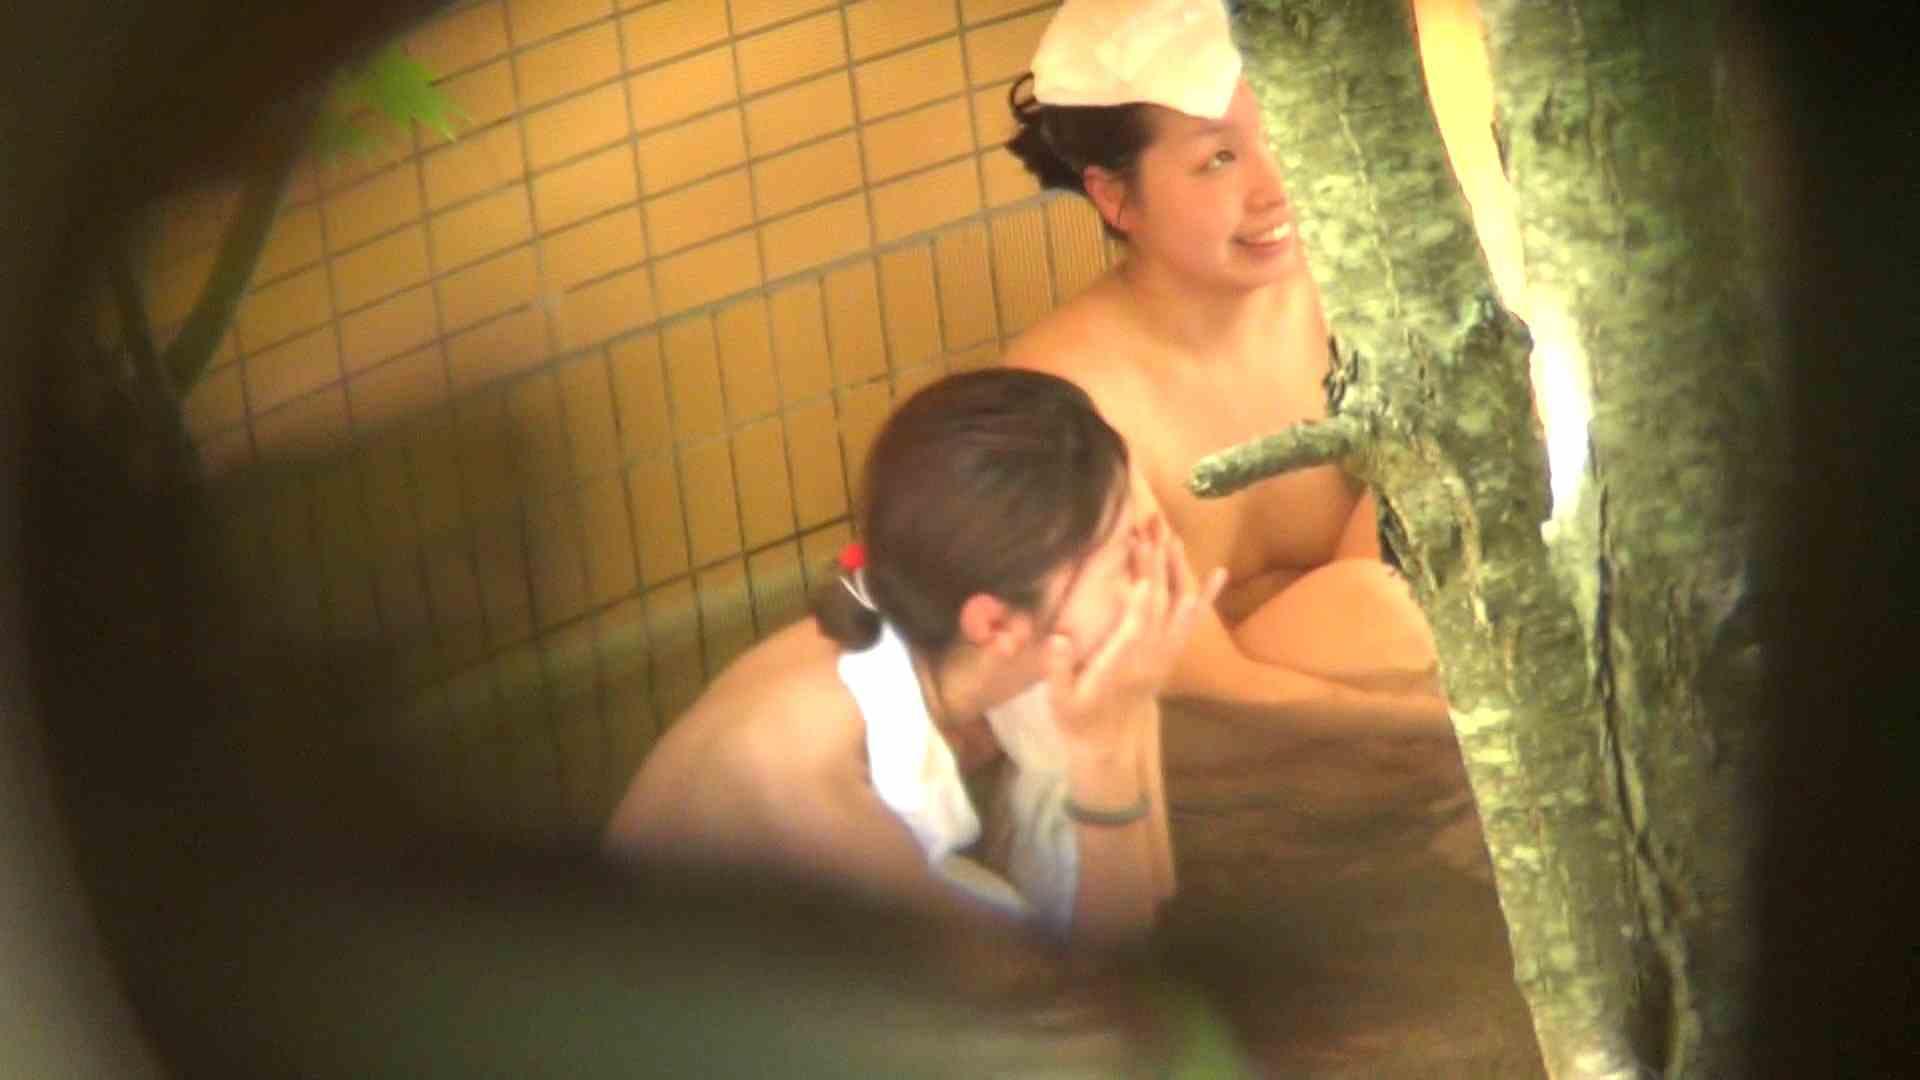 Vol.77 お上品な貧乳色白お女市さまの裸を見る醍醐味 露天入浴 AV無料 107枚 43